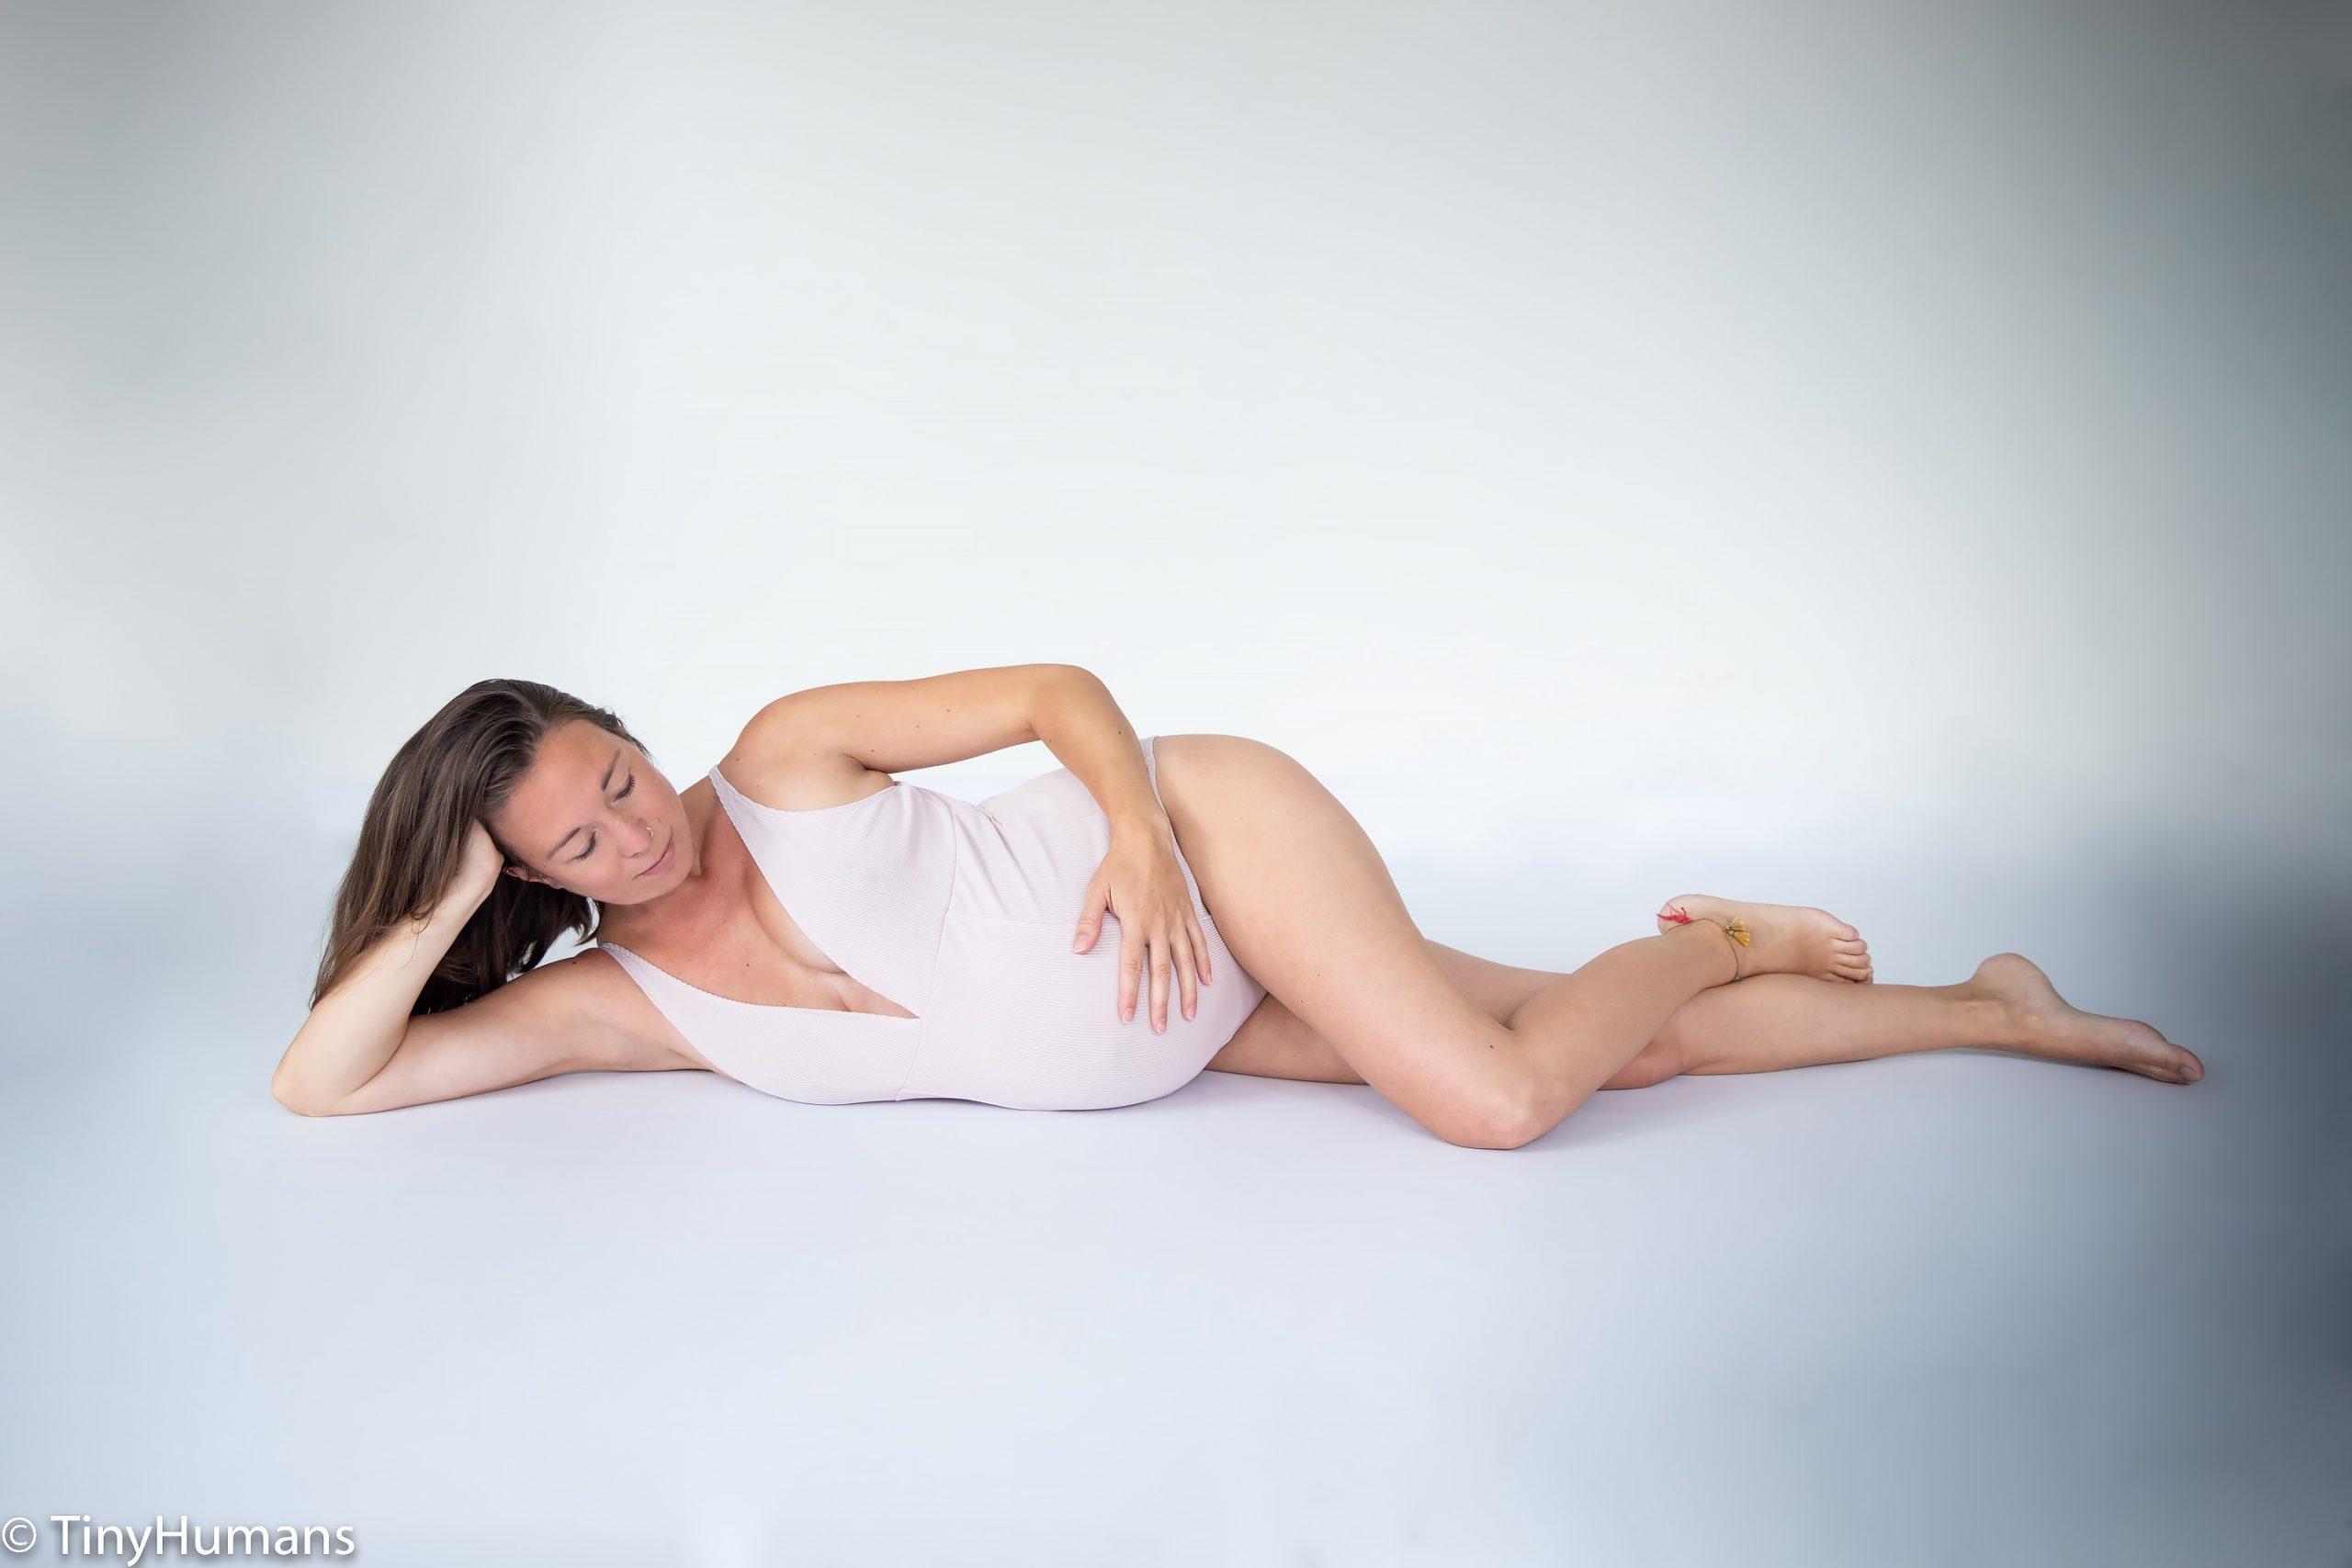 Pregnant woman loving her tummy at pregnancy photo shoot